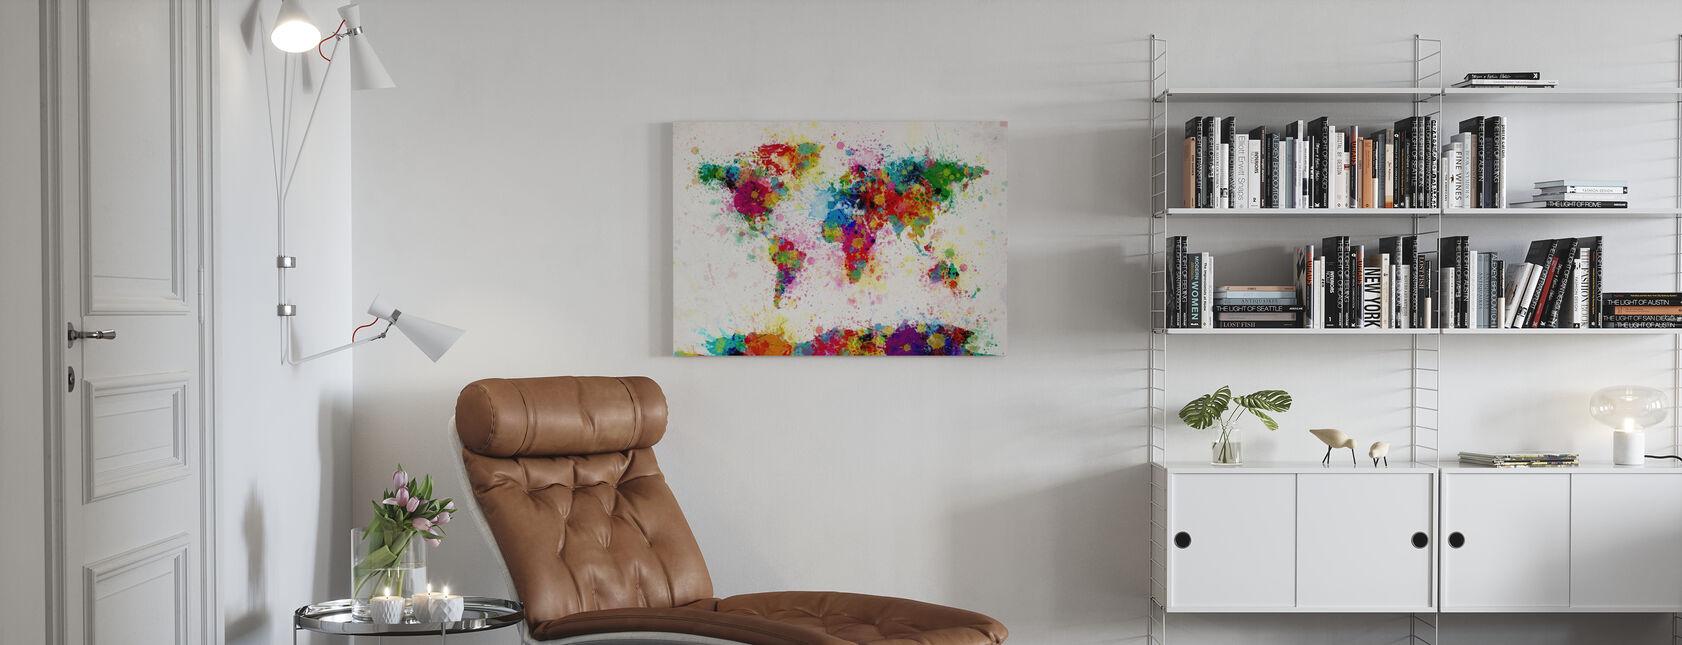 Mappa Paint Spruzzi - Stampa su tela - Salotto